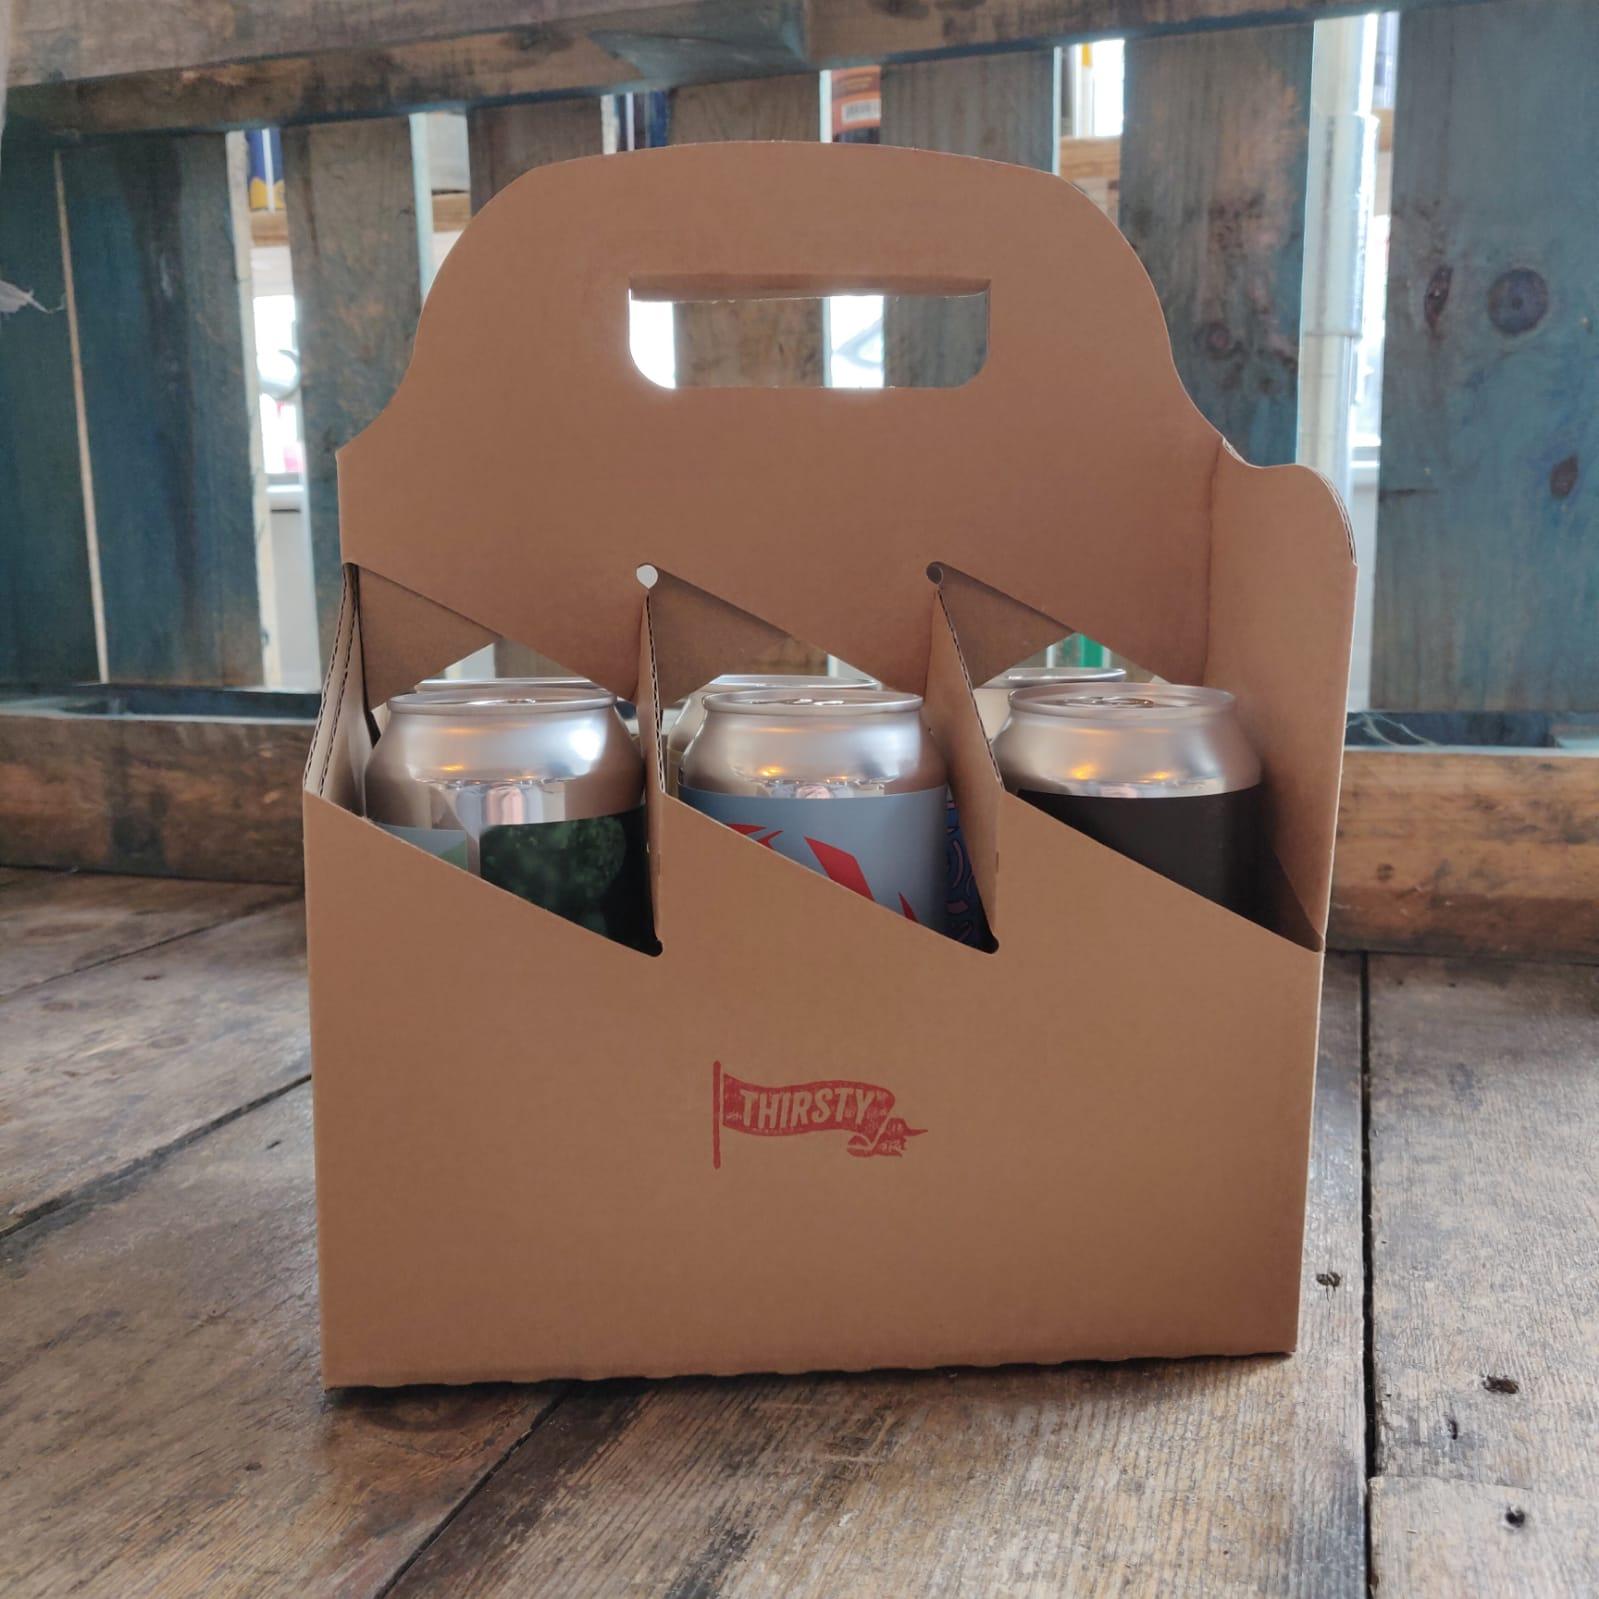 Thirsty Online Beer Festival | 'The Dark Side...'